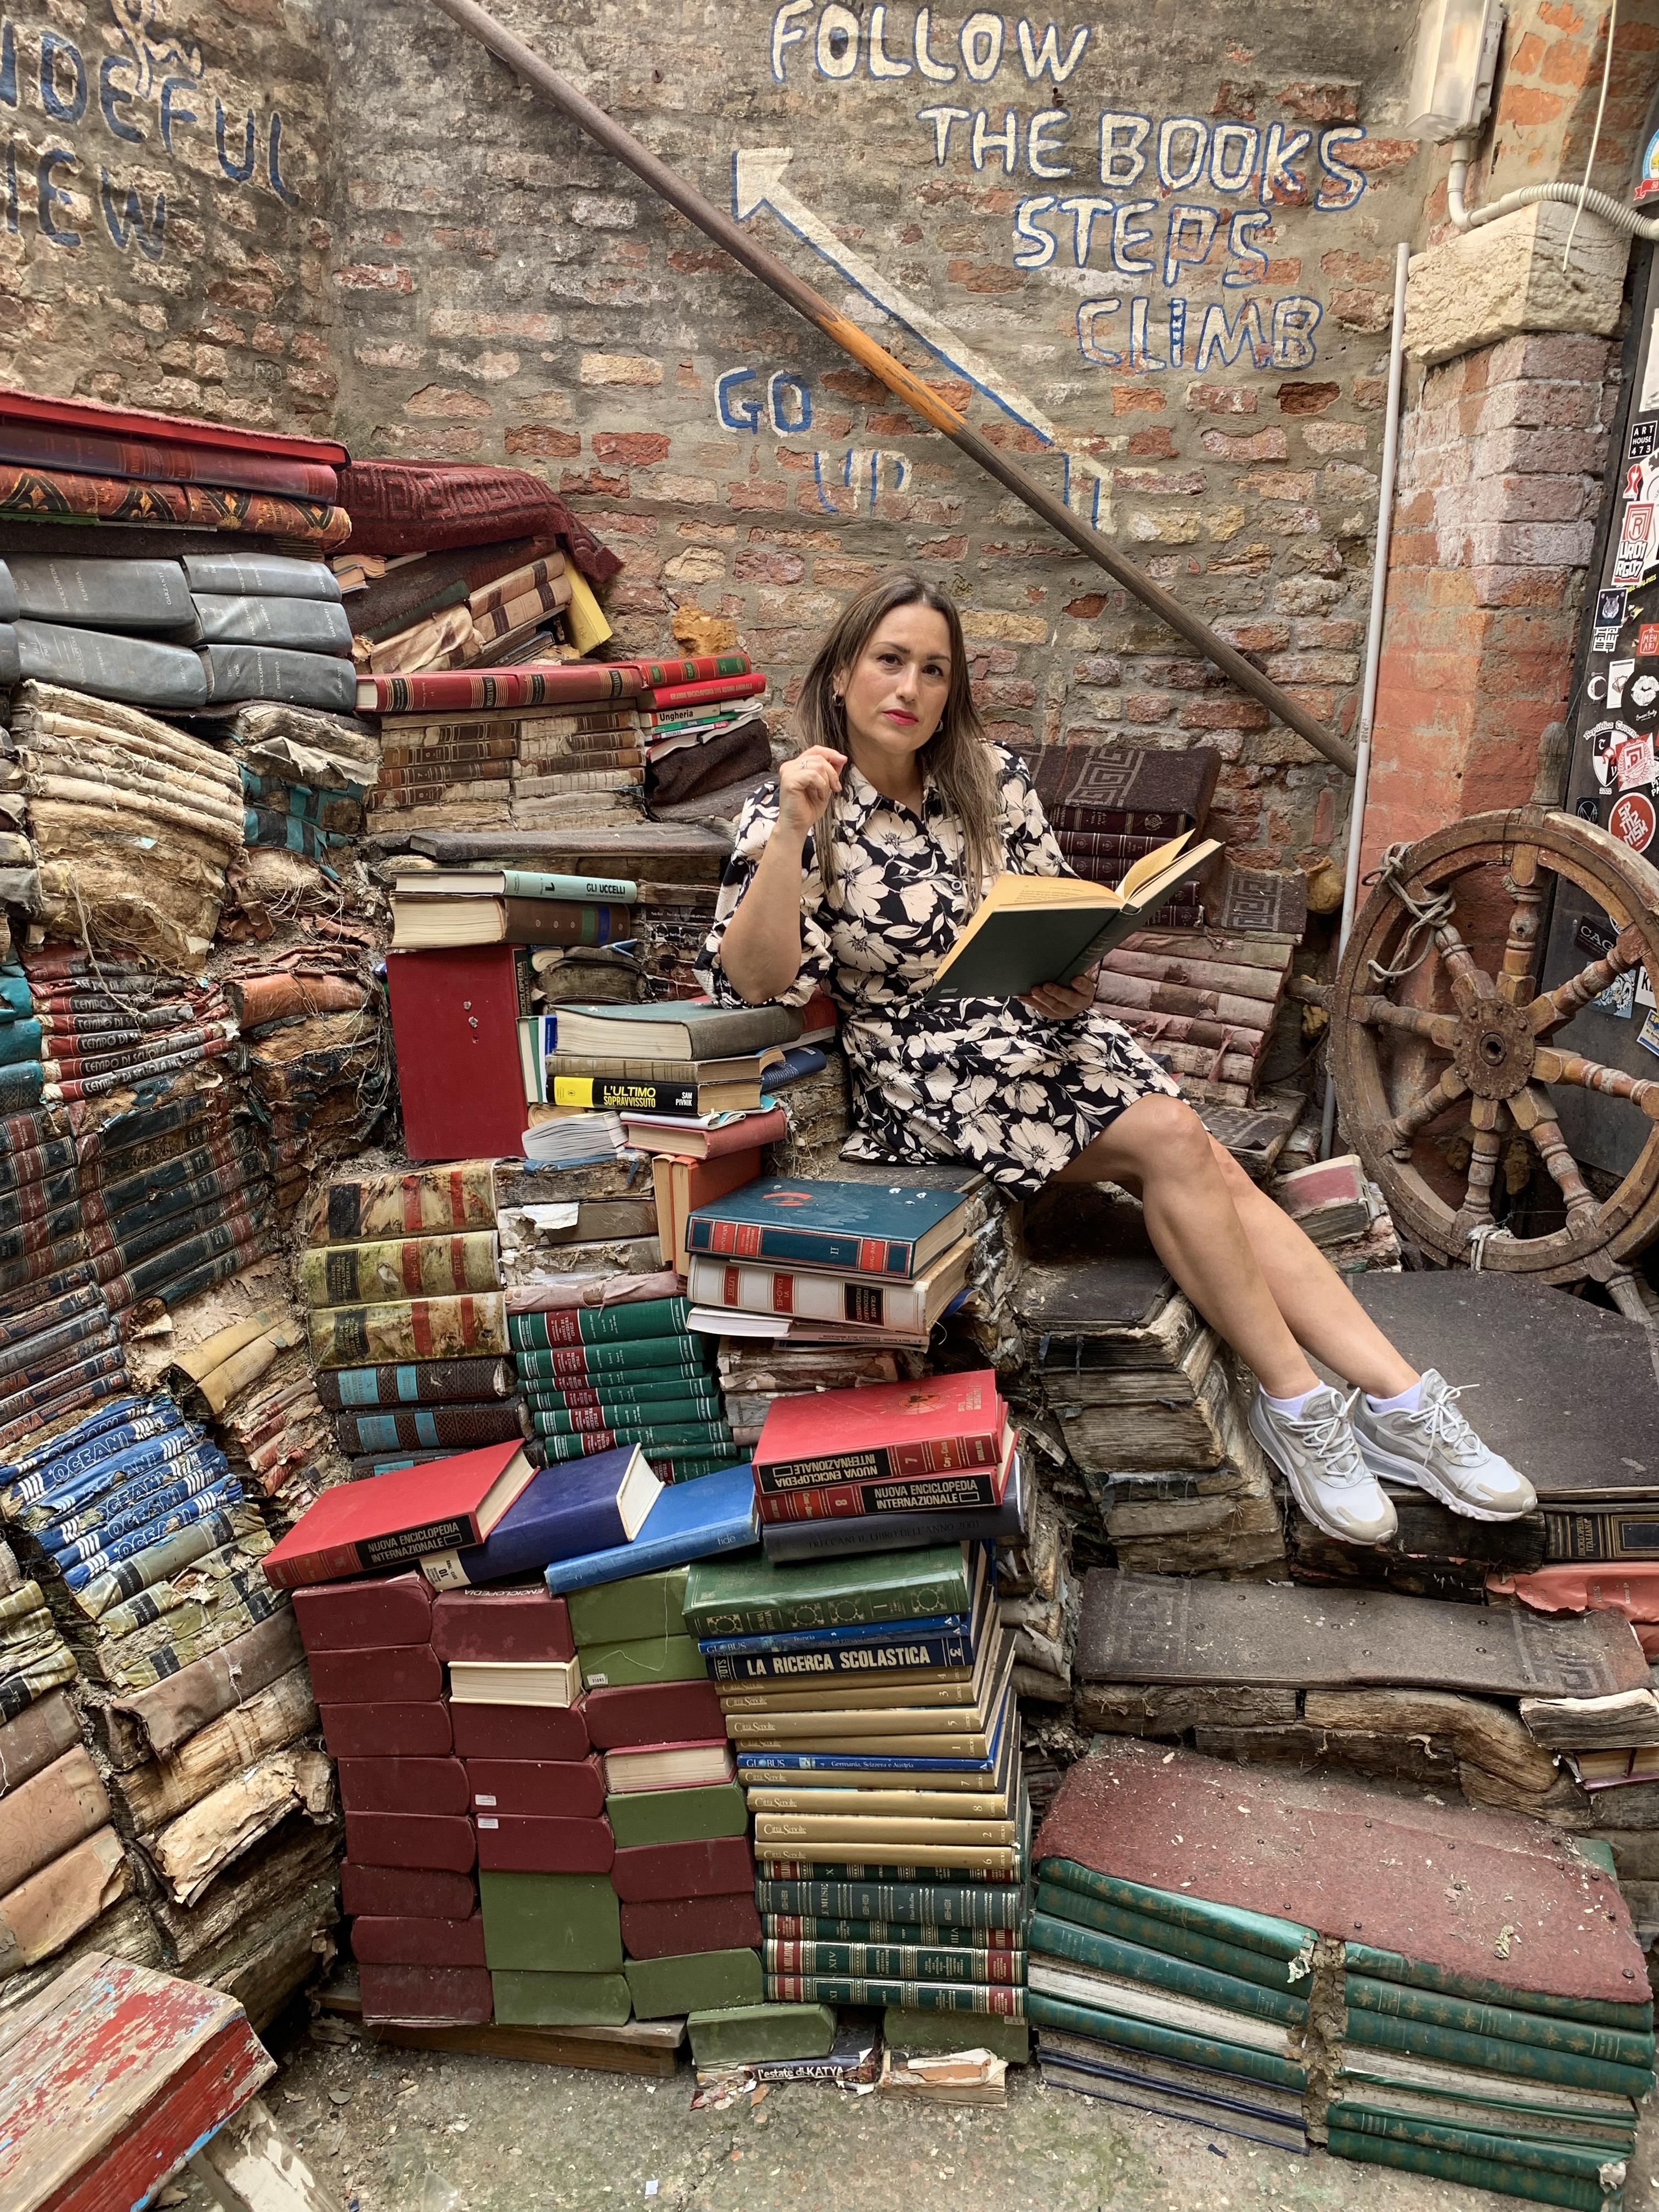 Libreria-acqua-alta-whynot-shopper-venecia-libros-segunda-mano-lifestyle-luigi-frizzo-blogger-influencer